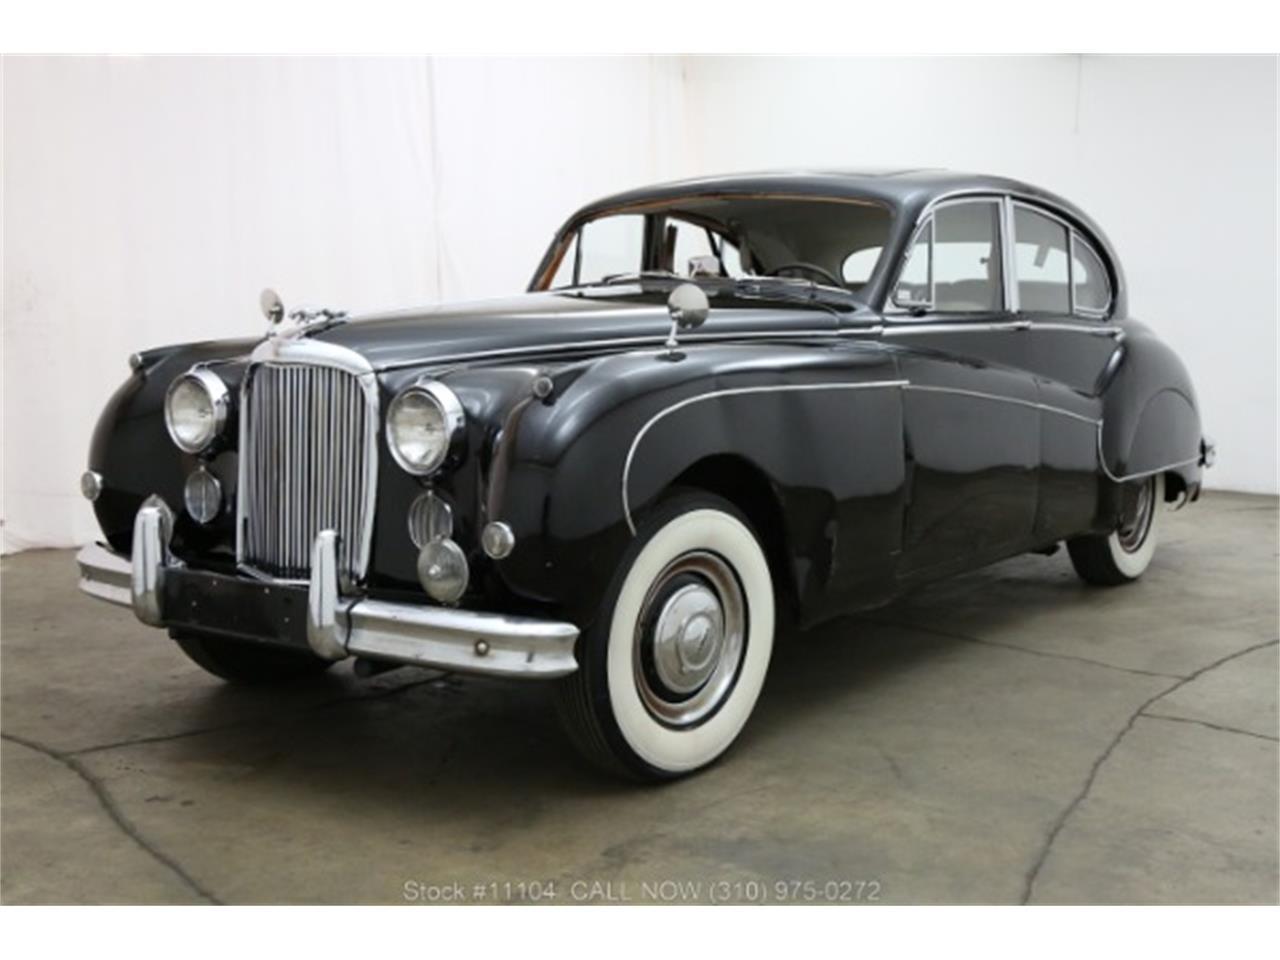 1961 Jaguar Mark IX for Sale | ClassicCars.com | CC-1246552